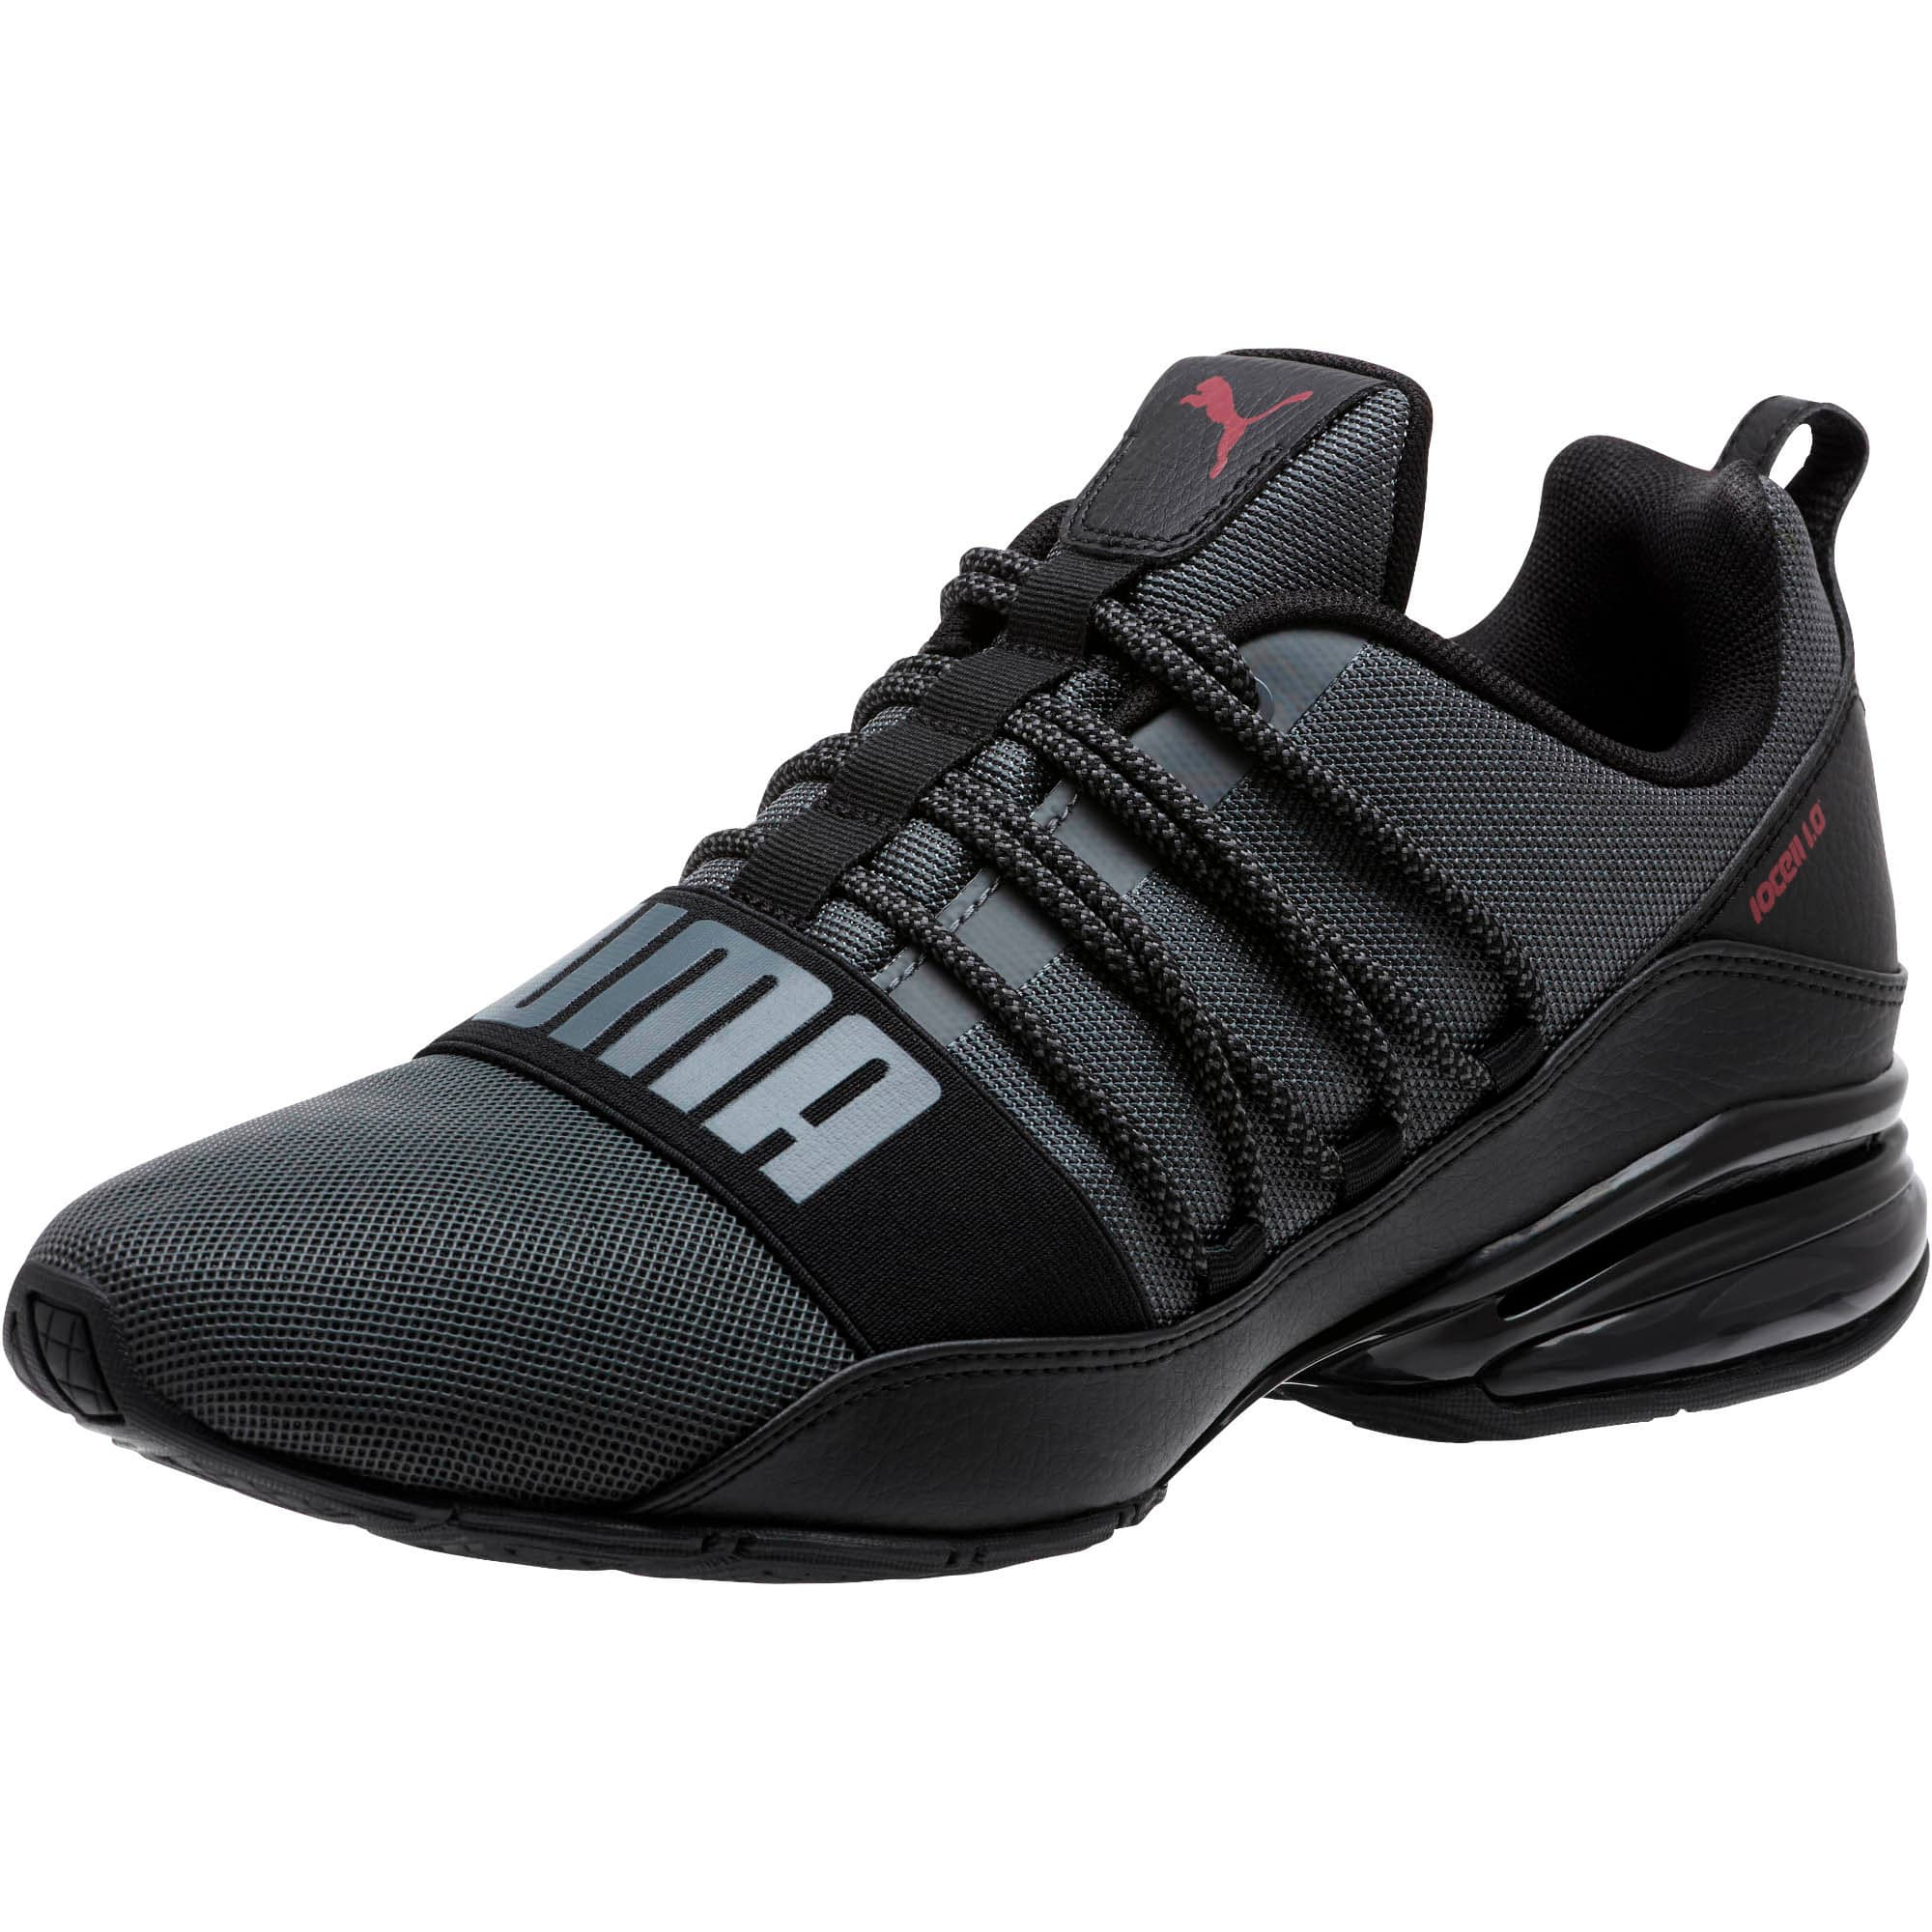 Thumbnail 1 of Cell Regulate KRM Men's Running Shoes, IronGate-PumaBlack-Pomegrnt, medium